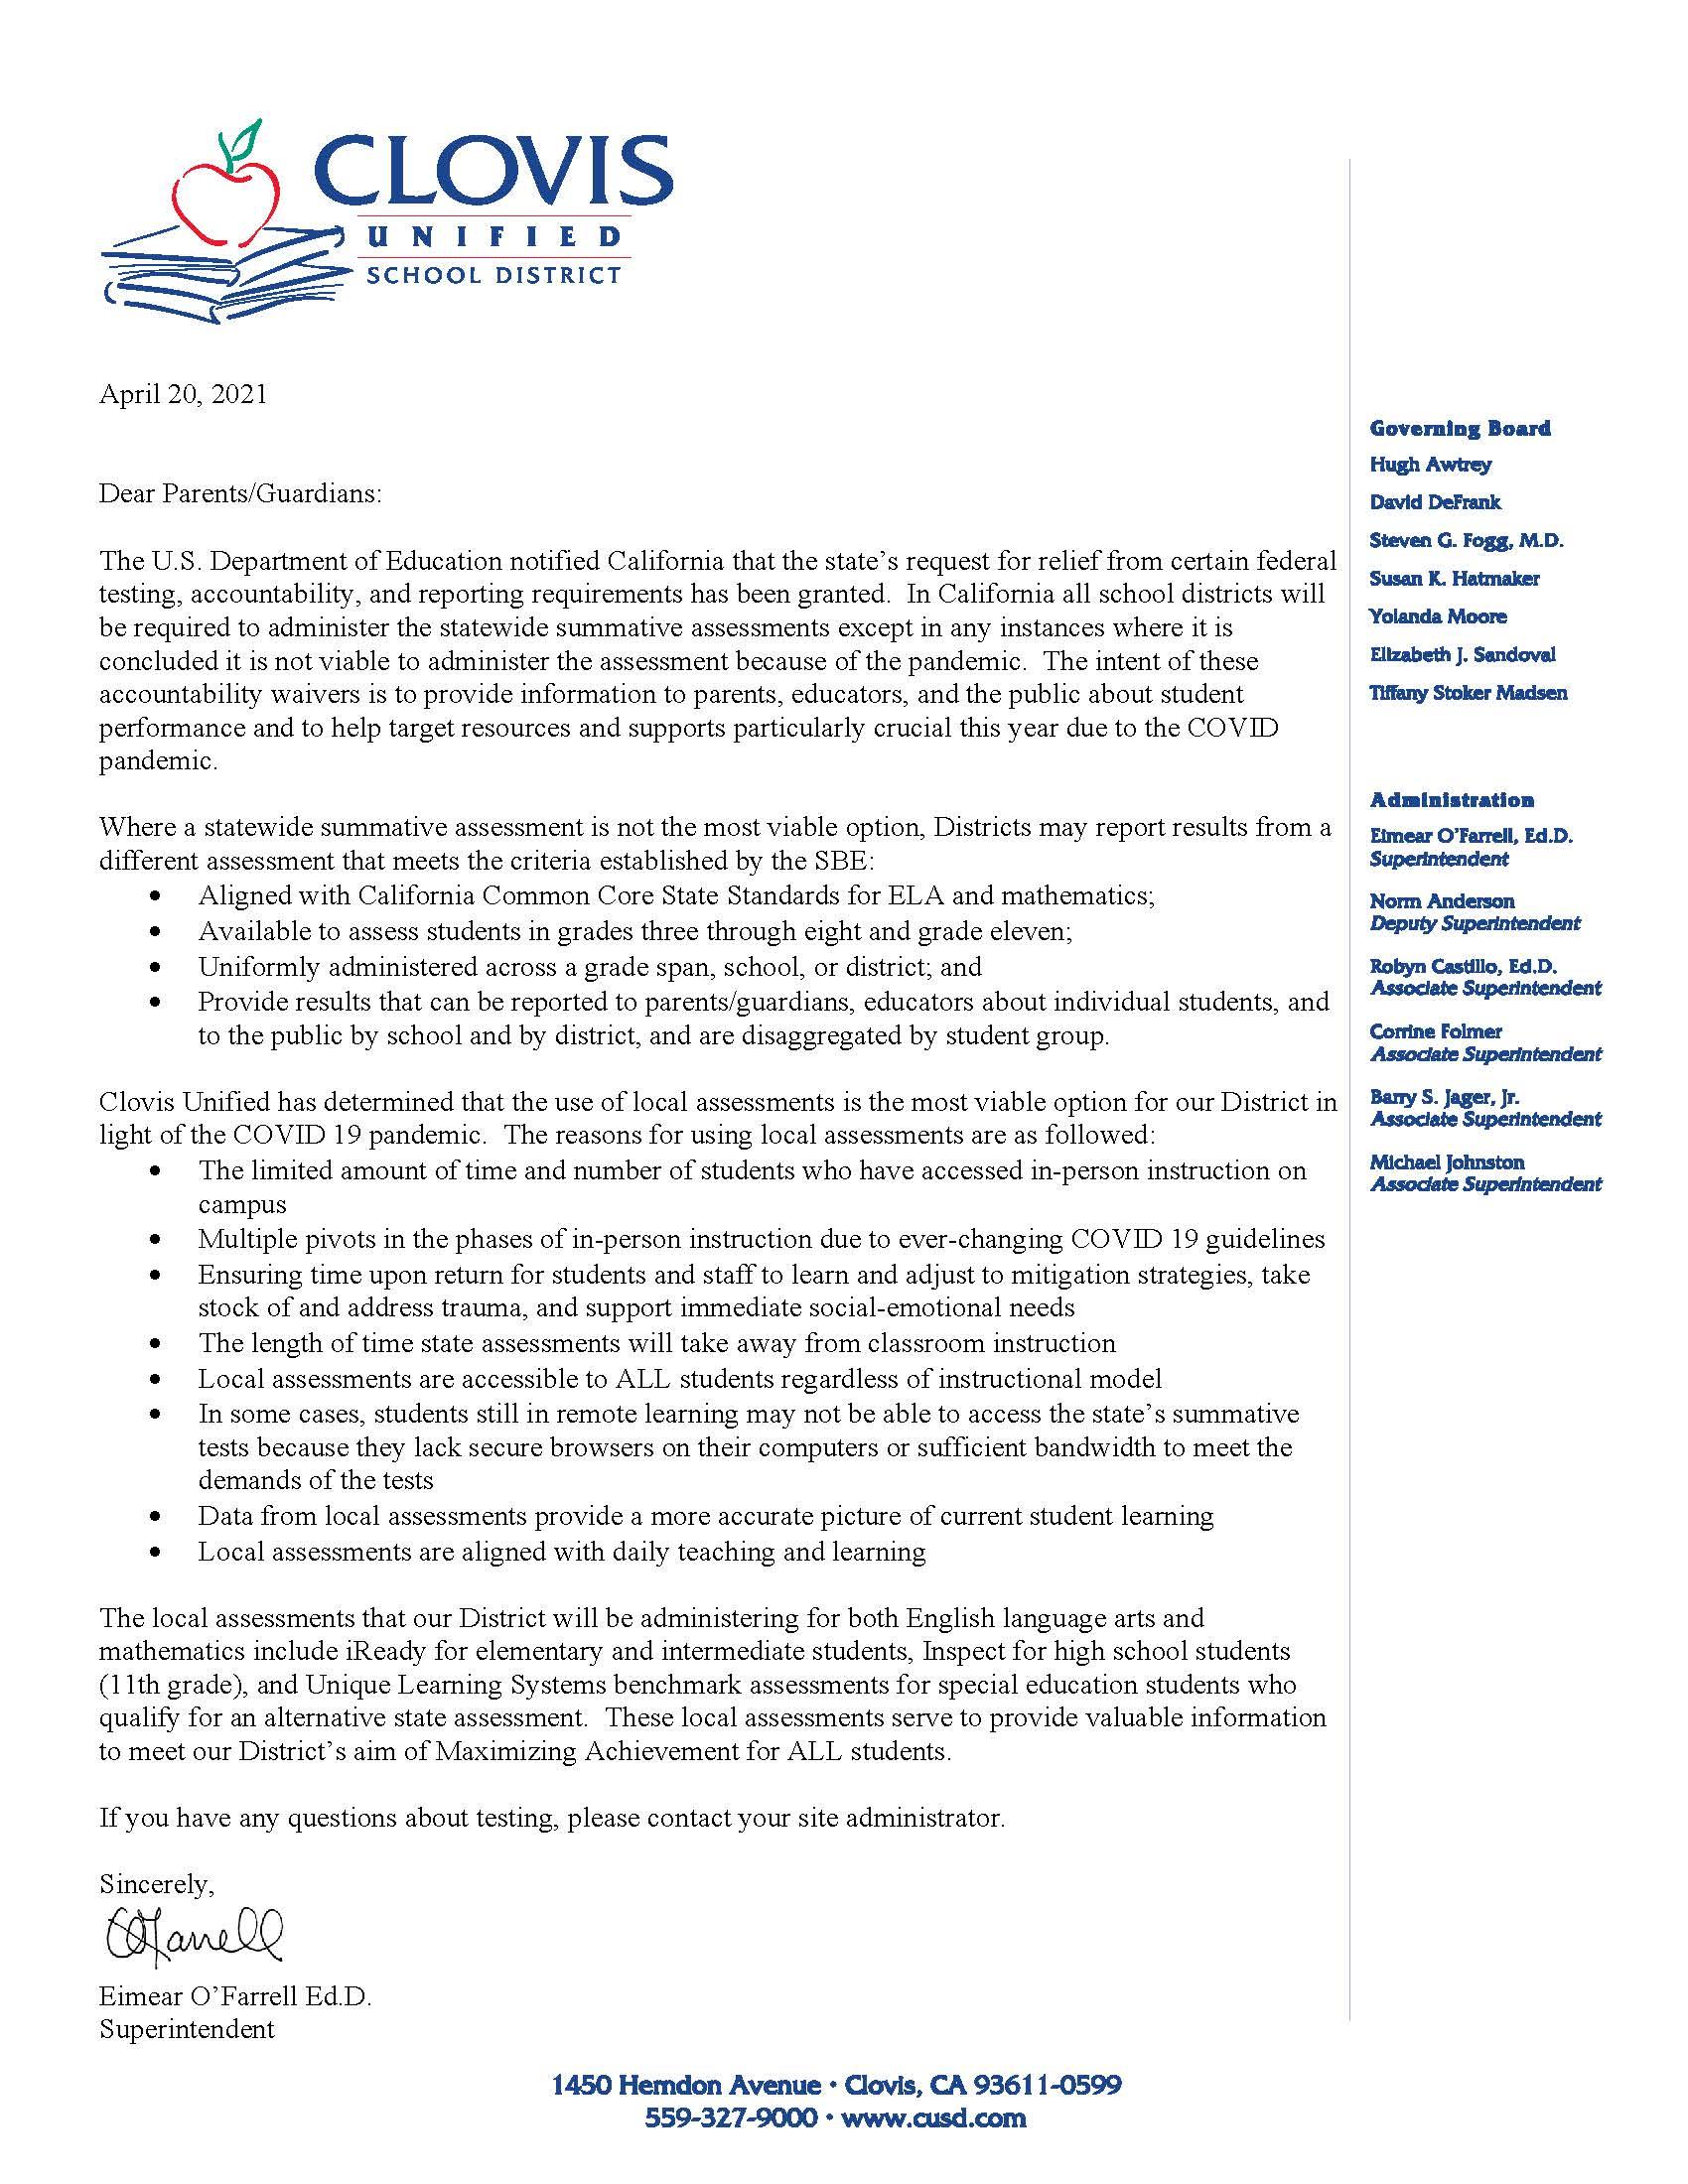 2021 Parent Testing Letter, link to PDF above